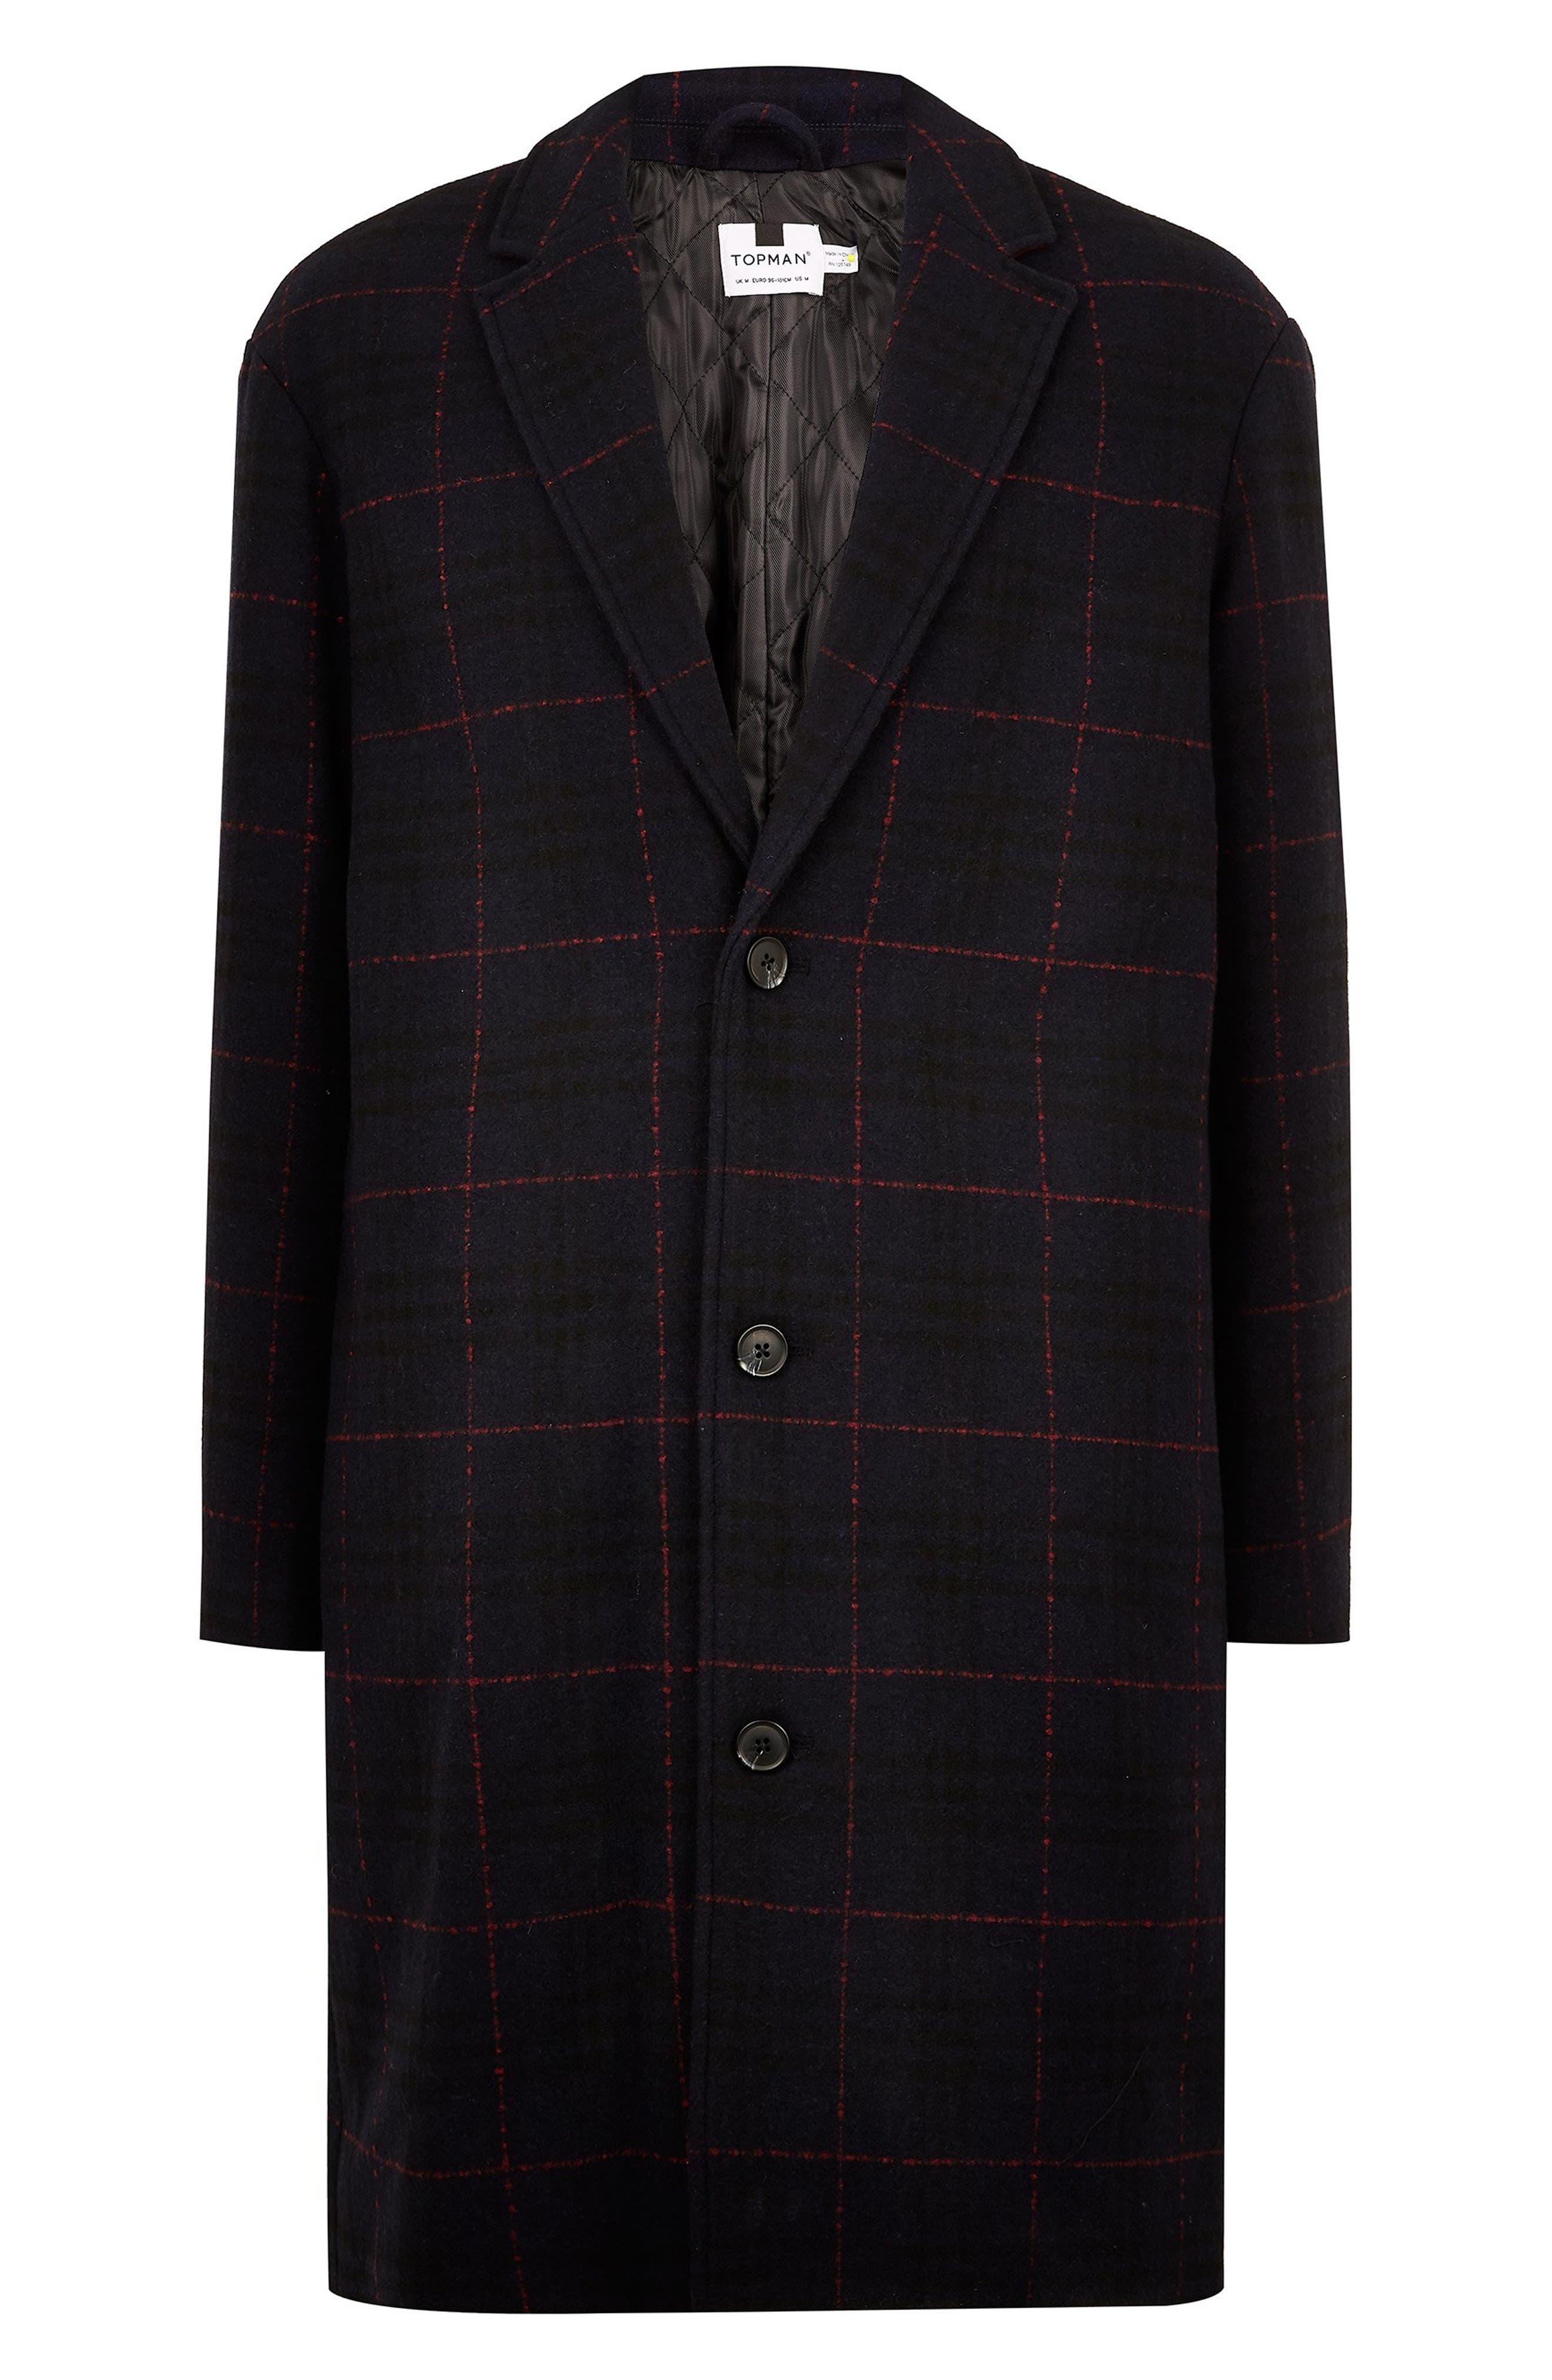 TOPMAN,                             Hadyn Oversize Check Print Overcoat,                             Alternate thumbnail 4, color,                             401